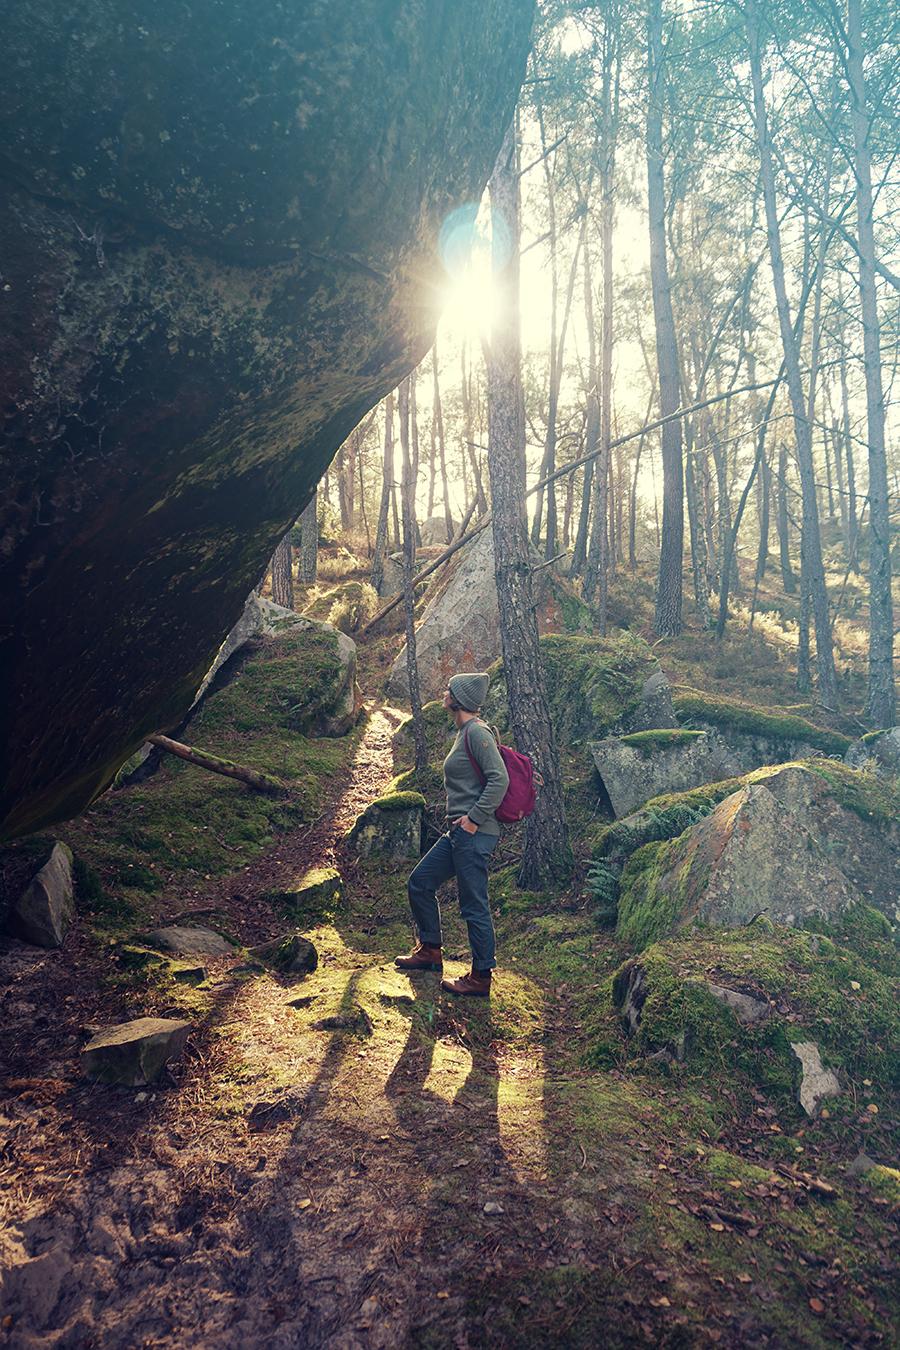 Into the woods with Fjällräven